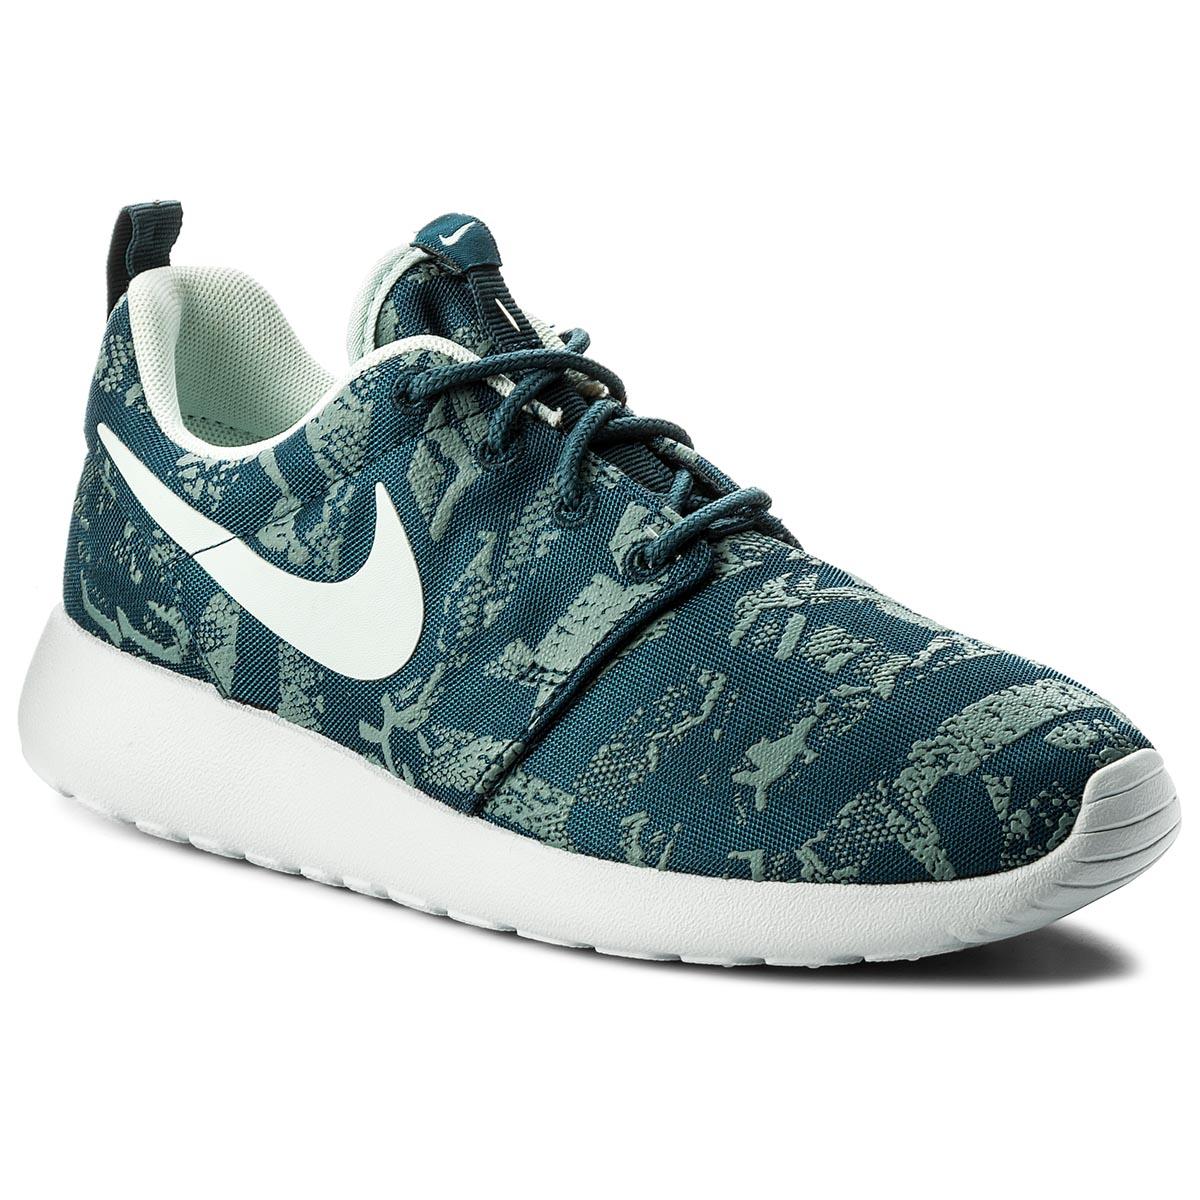 Zöld, Nike Roshe One Női sportcipők GLAMI.hu